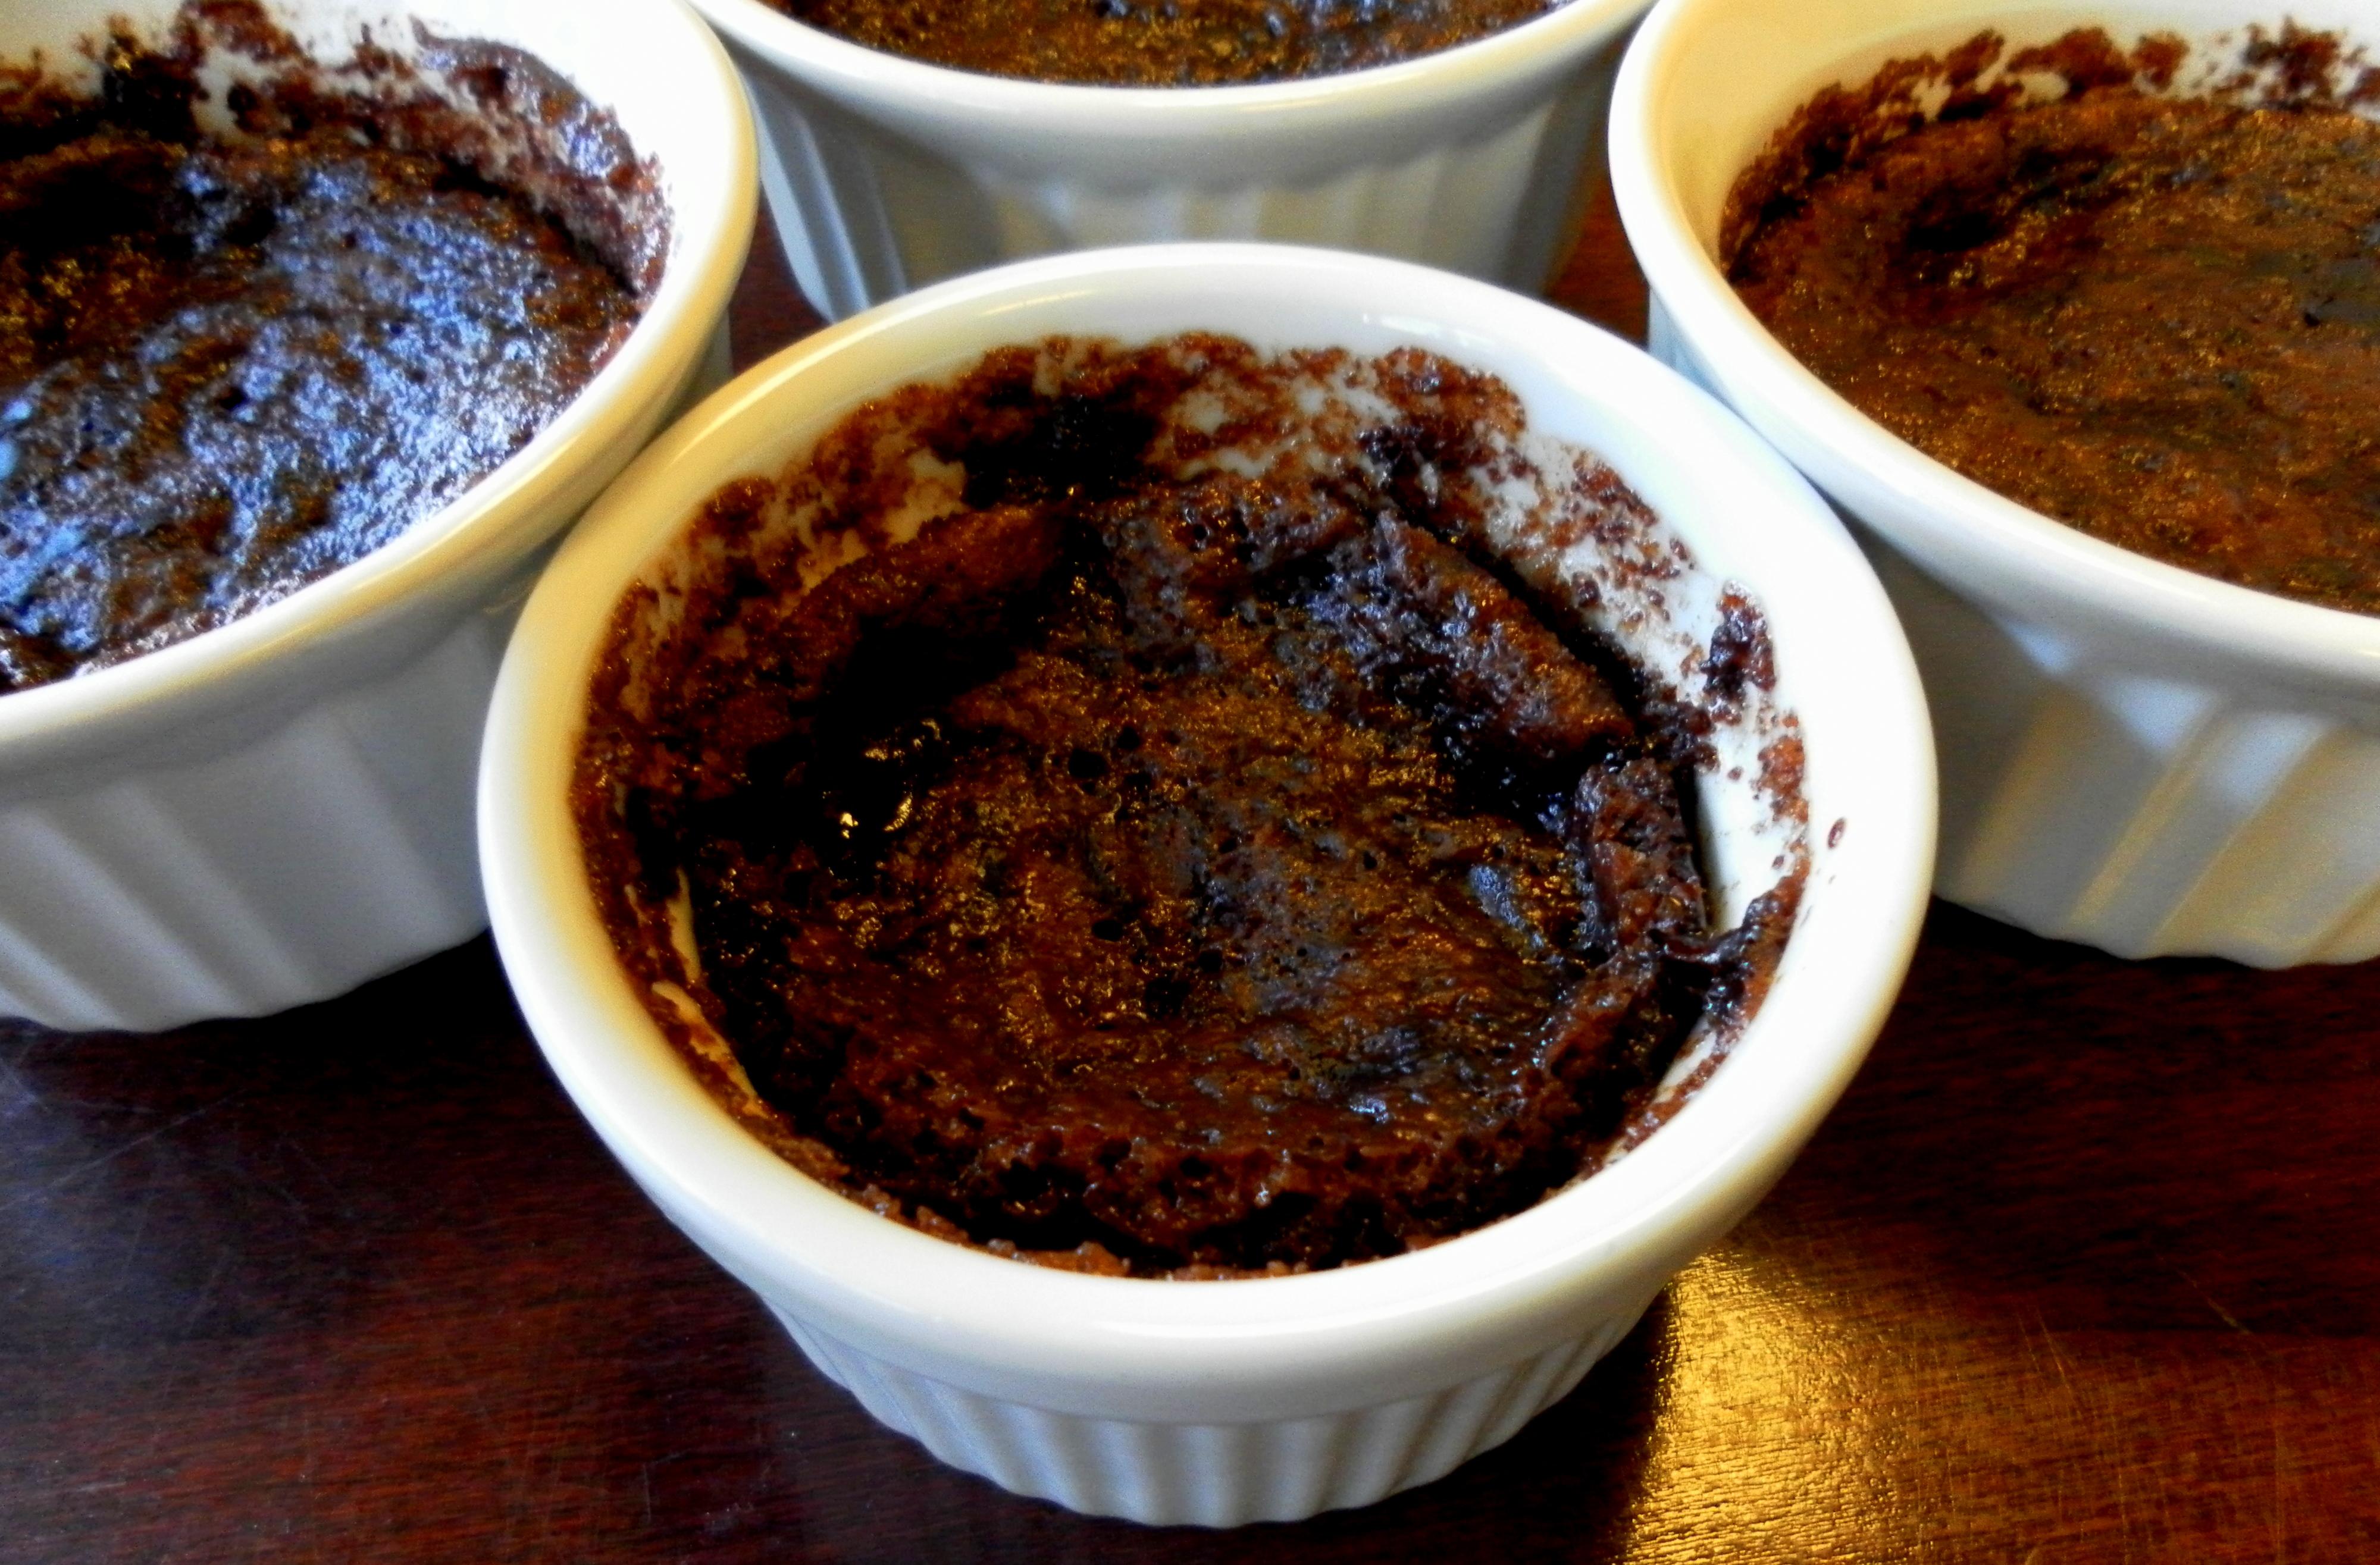 gooey-chocolate-pudding-cake-021.jpg